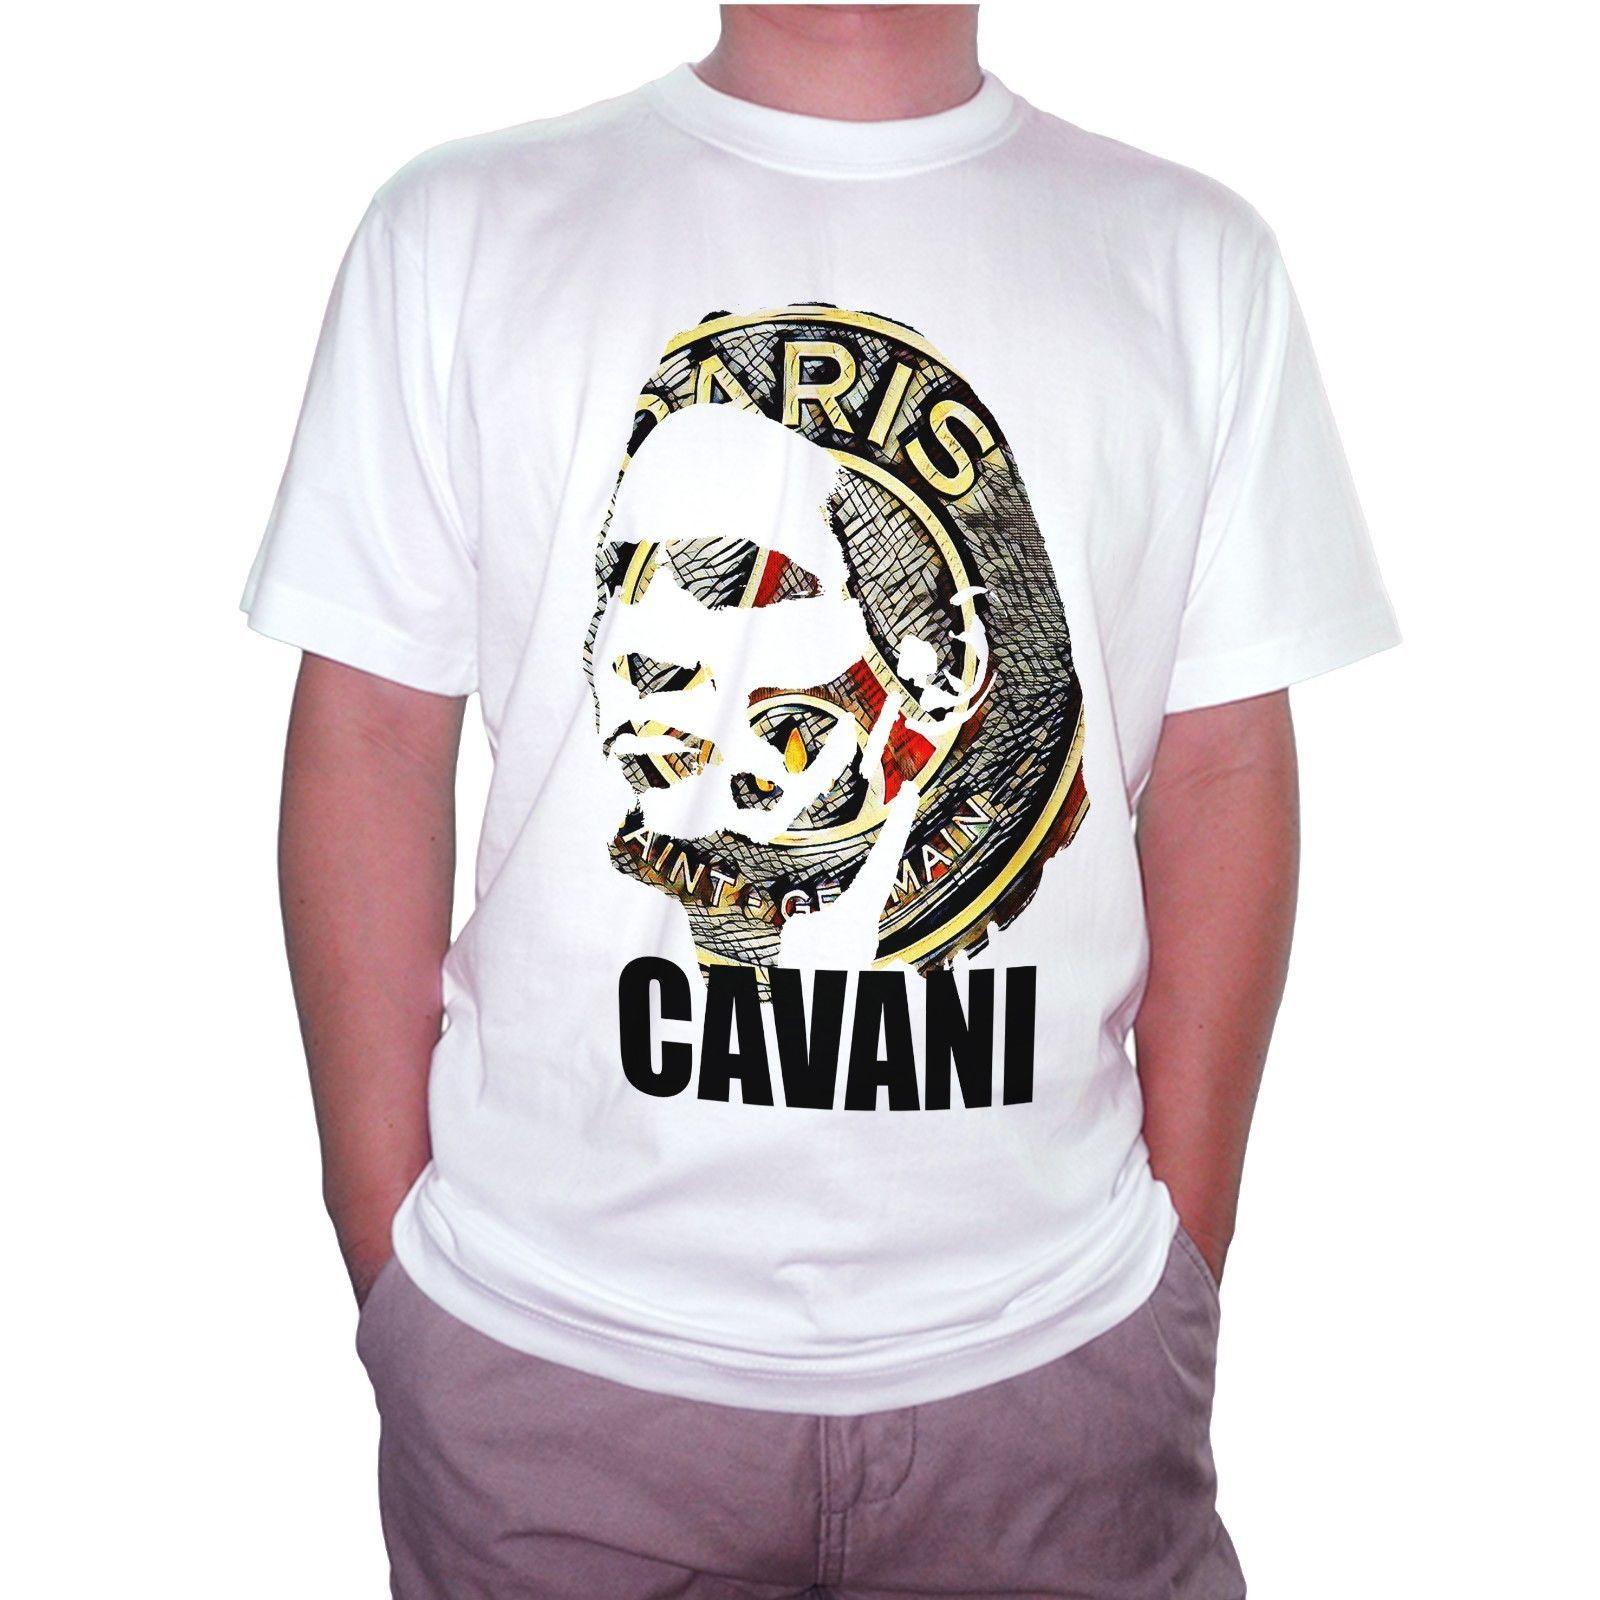 374f02616 T Shirt Of Edinson Cavani Uruguay Soccer Star Graphics Men Kids Fans Gifts  Mens 2018 Fashionable Brand 100%cotton Cheap Wholesale Tees Buy Shirts T  Shirt ...